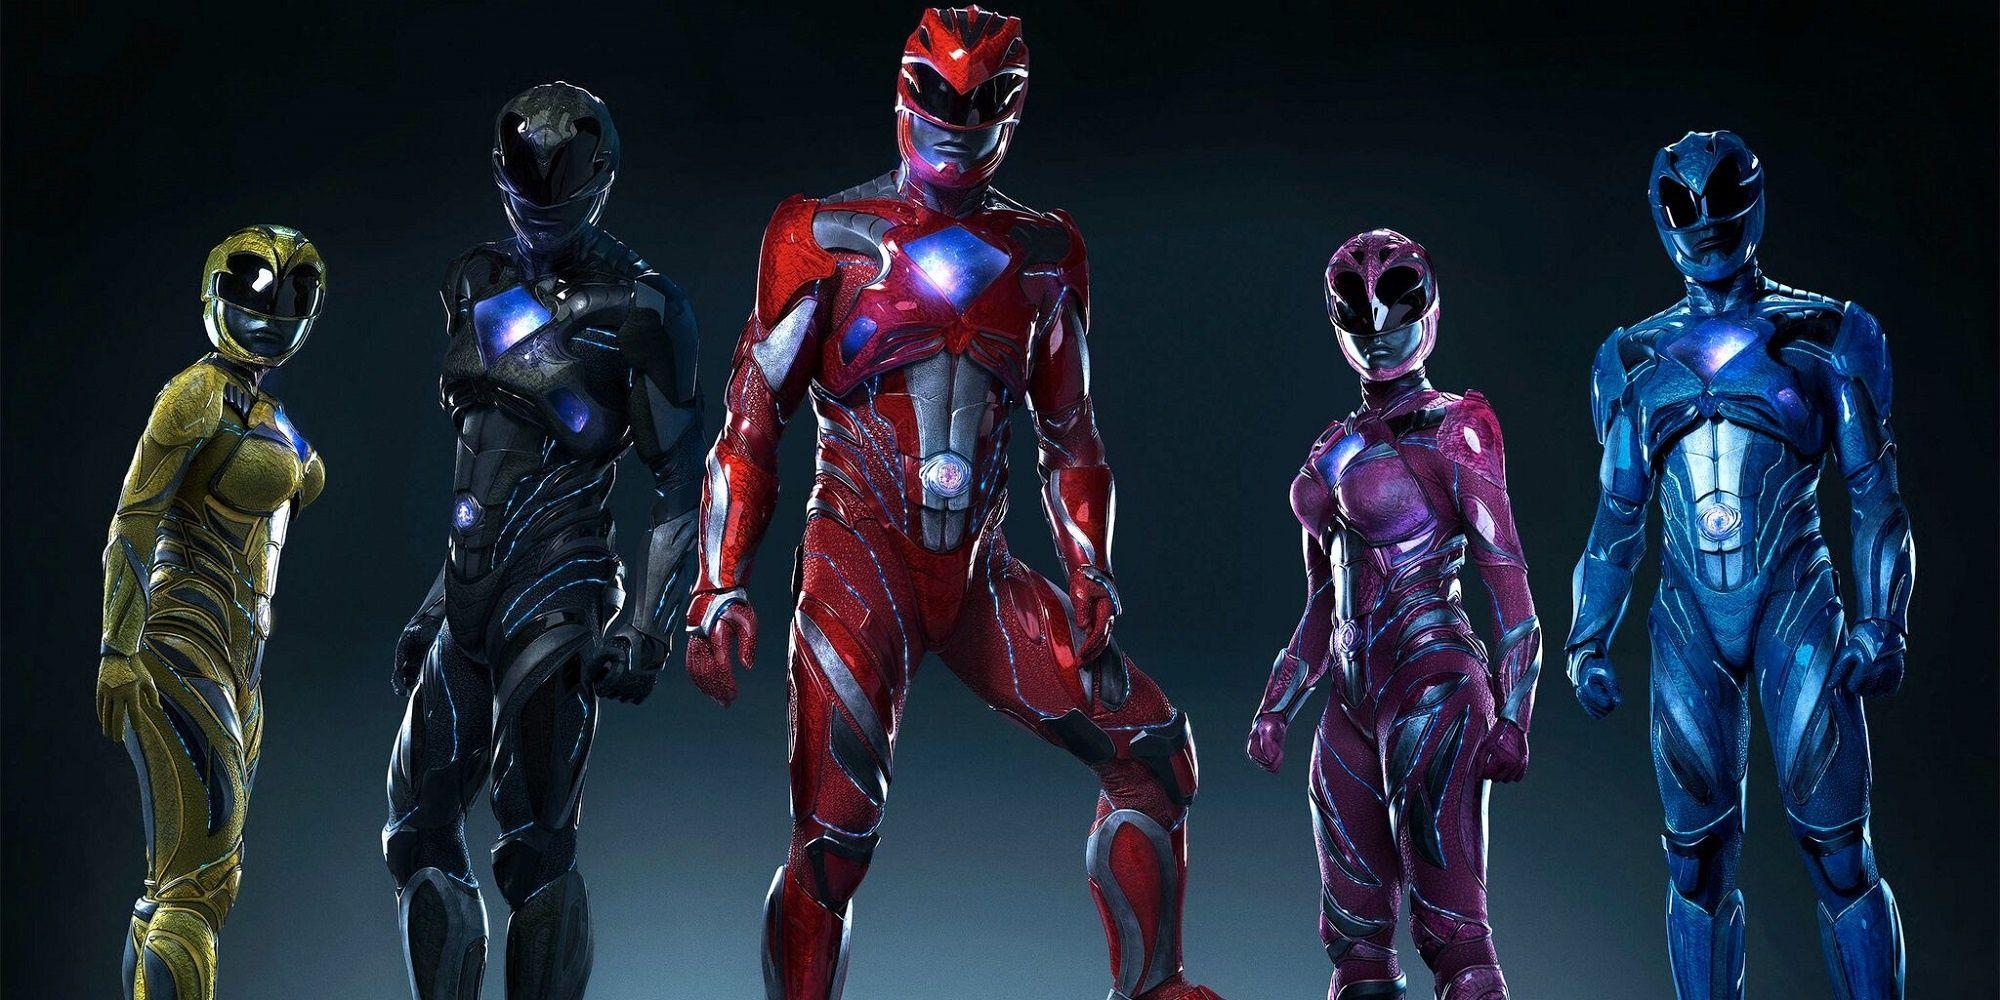 Power Rangers Reboot Concept Art Reimagines the Red Ranger | CBR